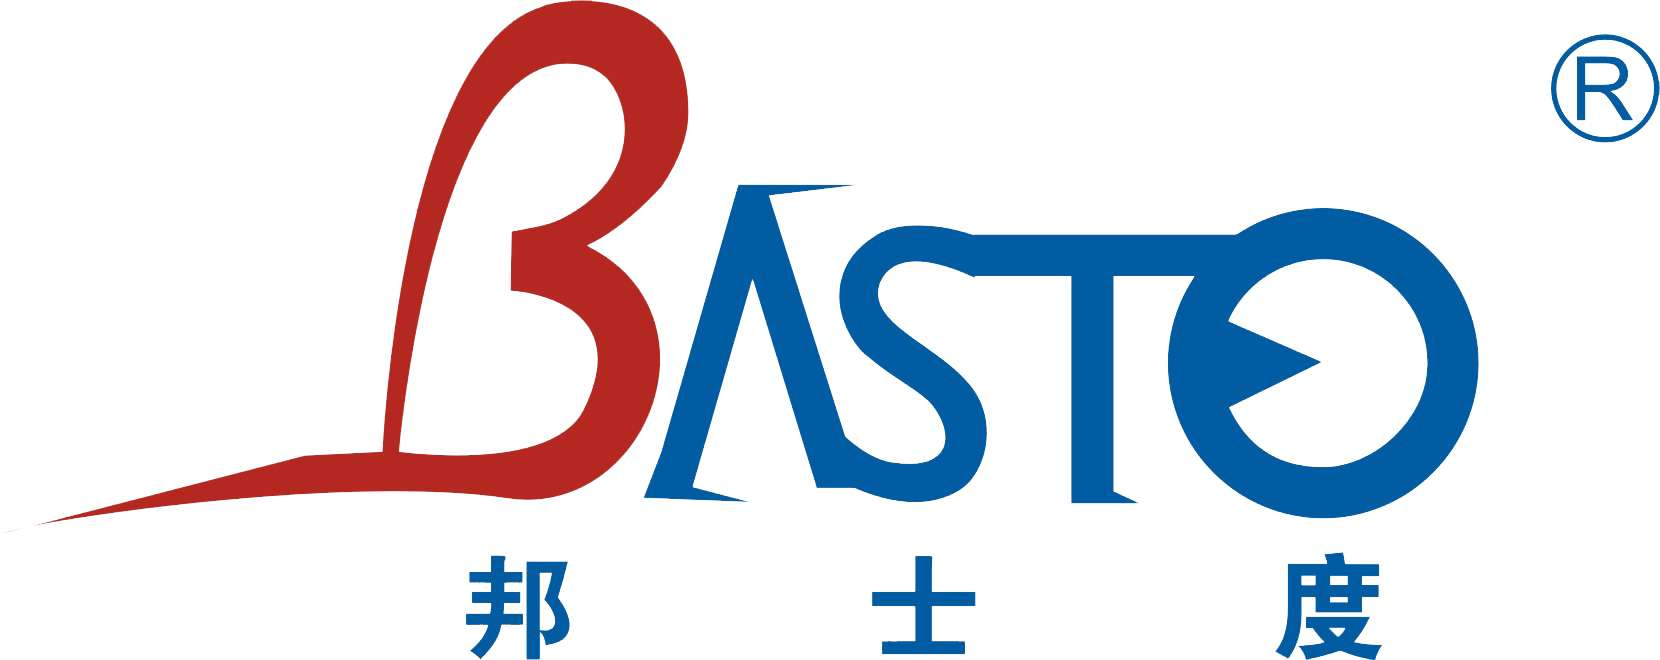 BASTO邦士度